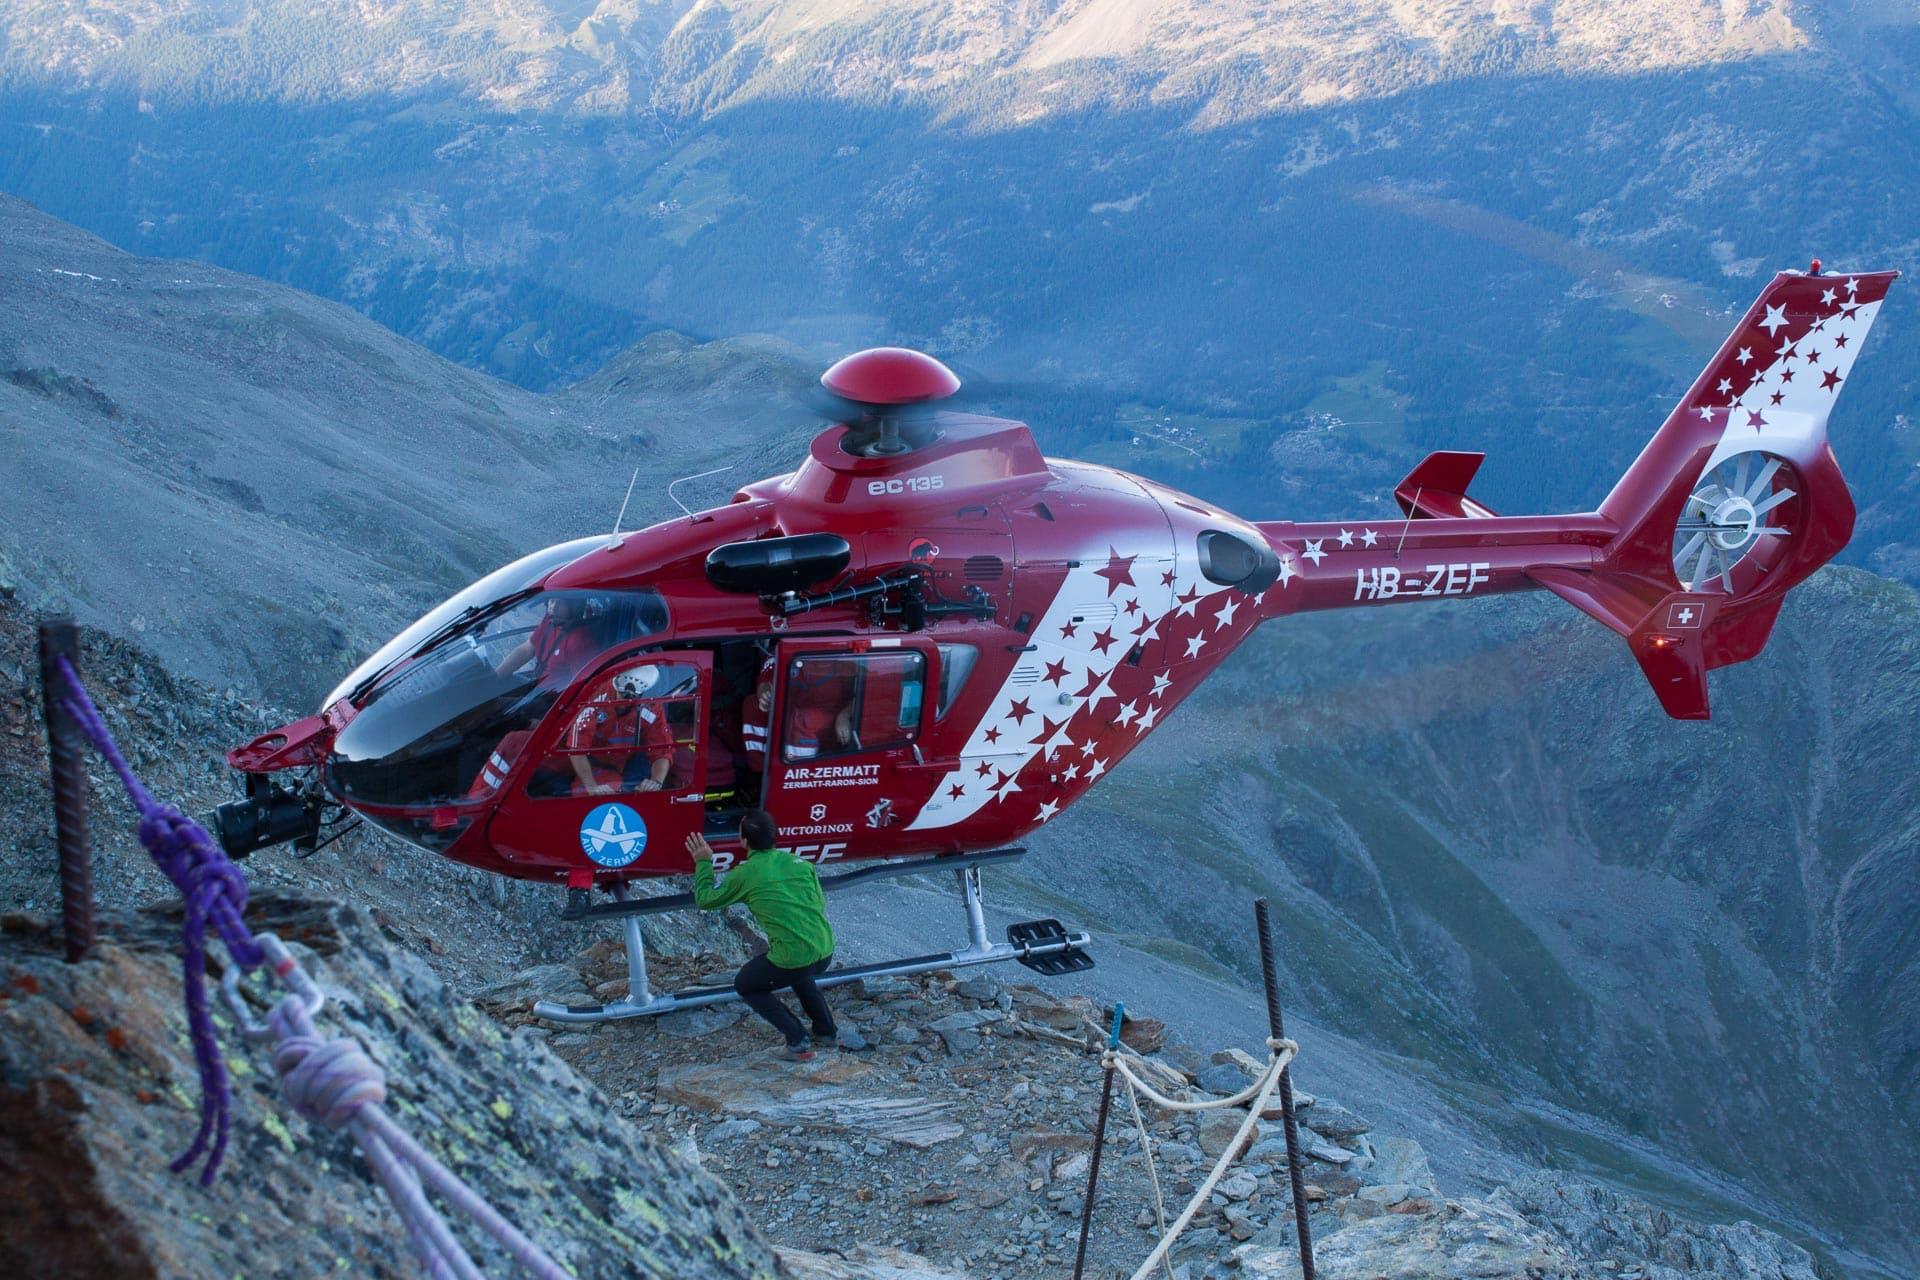 Helikopter der Air Zermatt an der Mischabelhütte